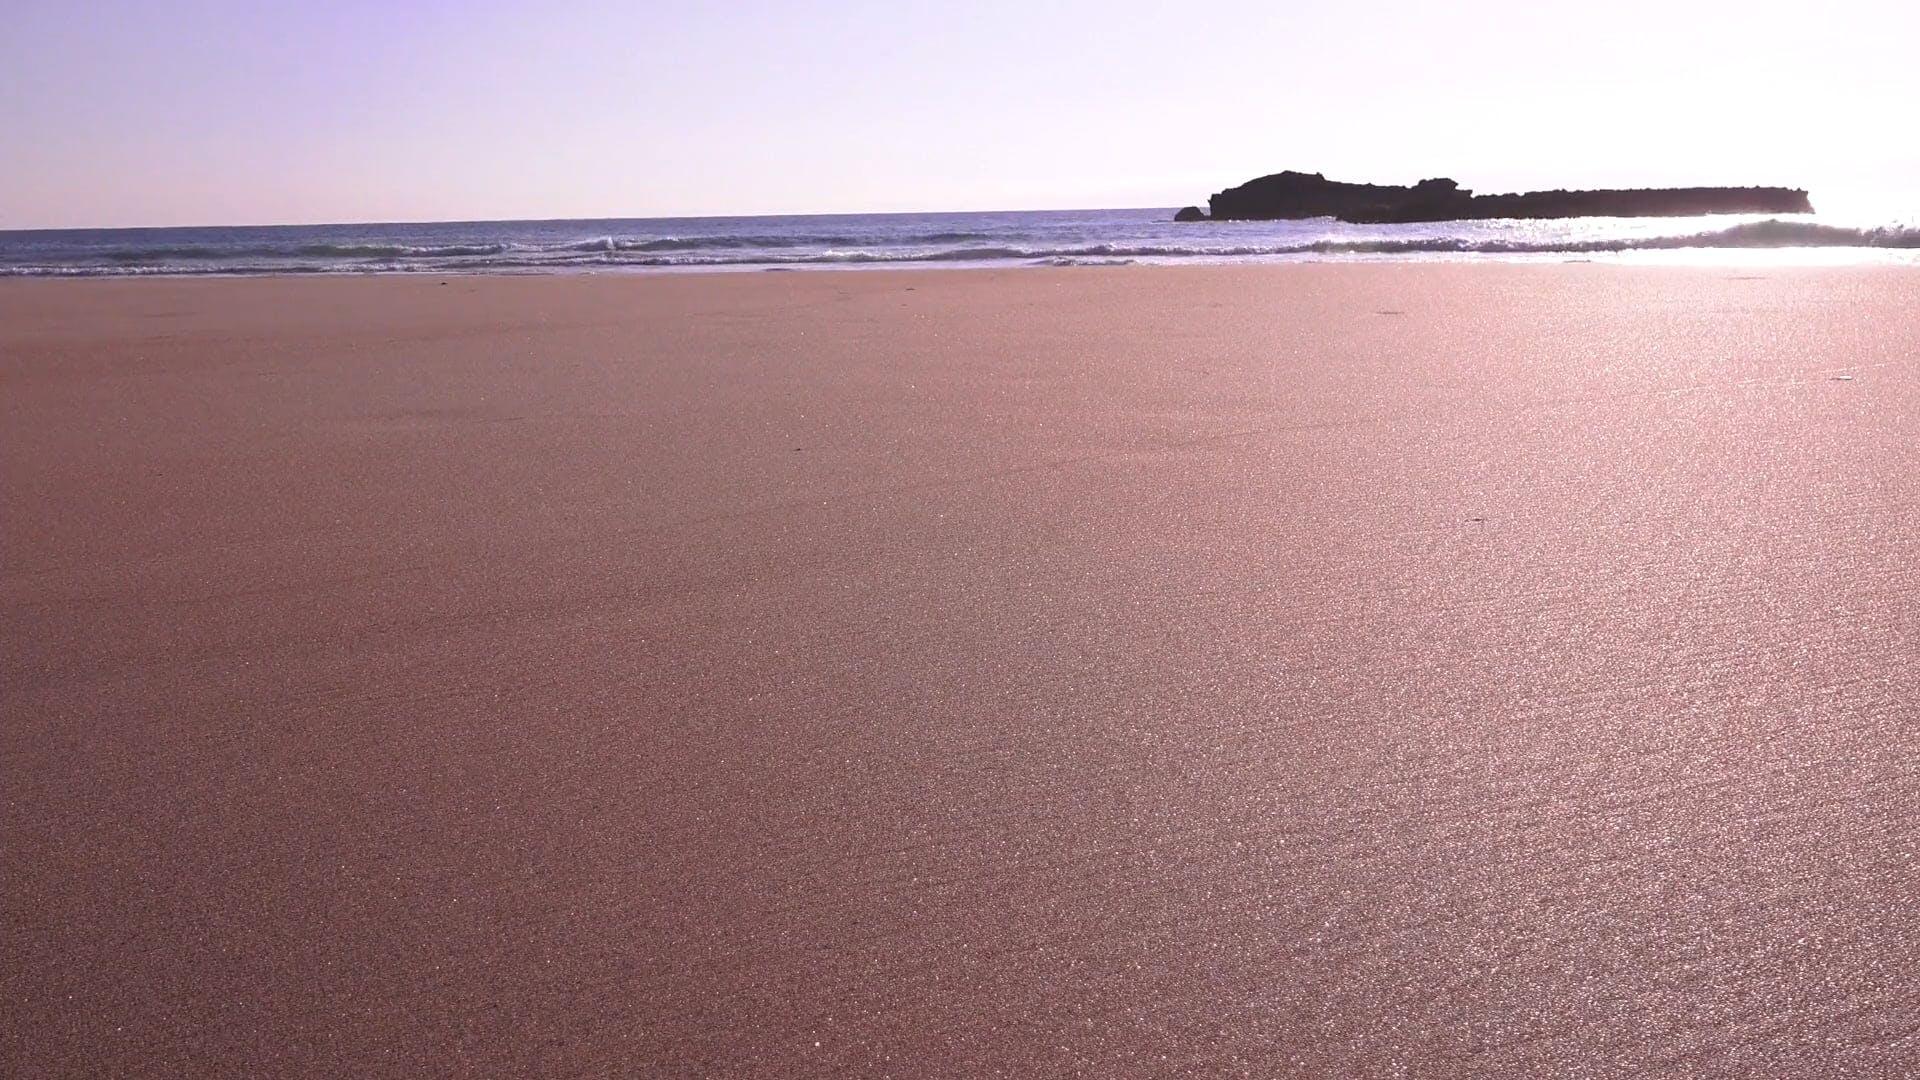 Beach Sand And Waves